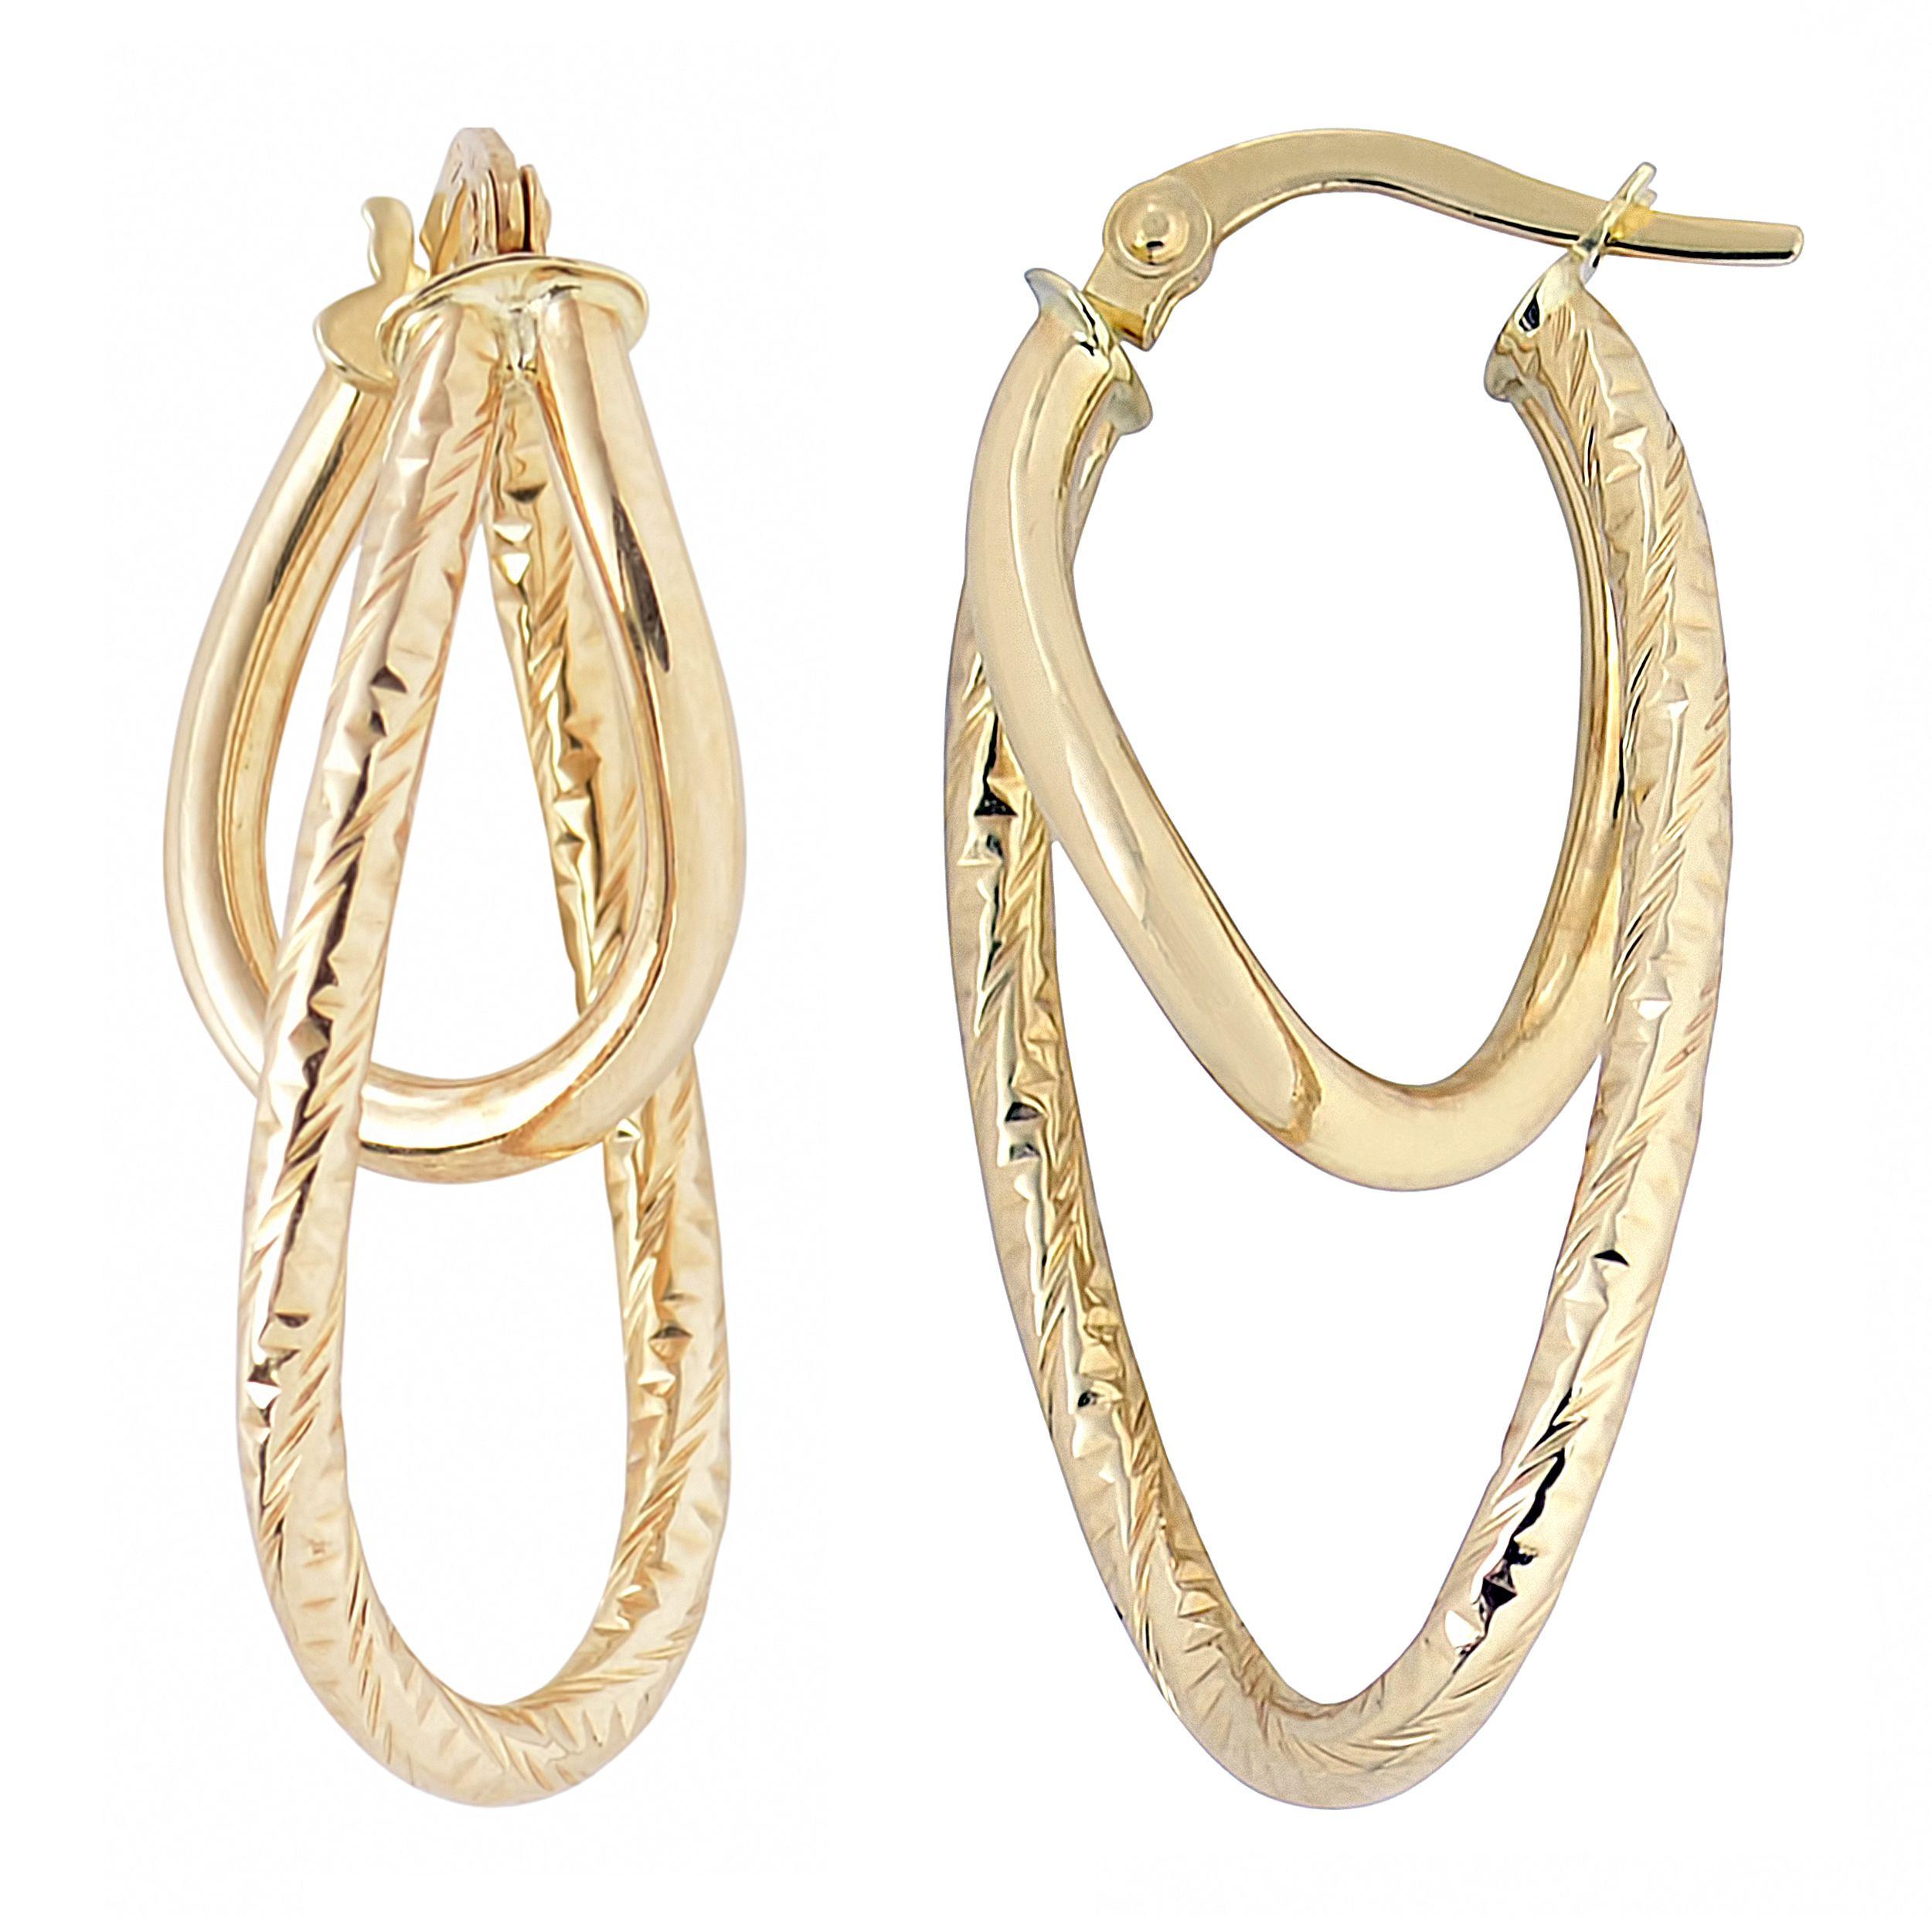 Fremada Italian 14k Gold High Polish and Diamond-cut Finished Double Oval Hoop Earrings